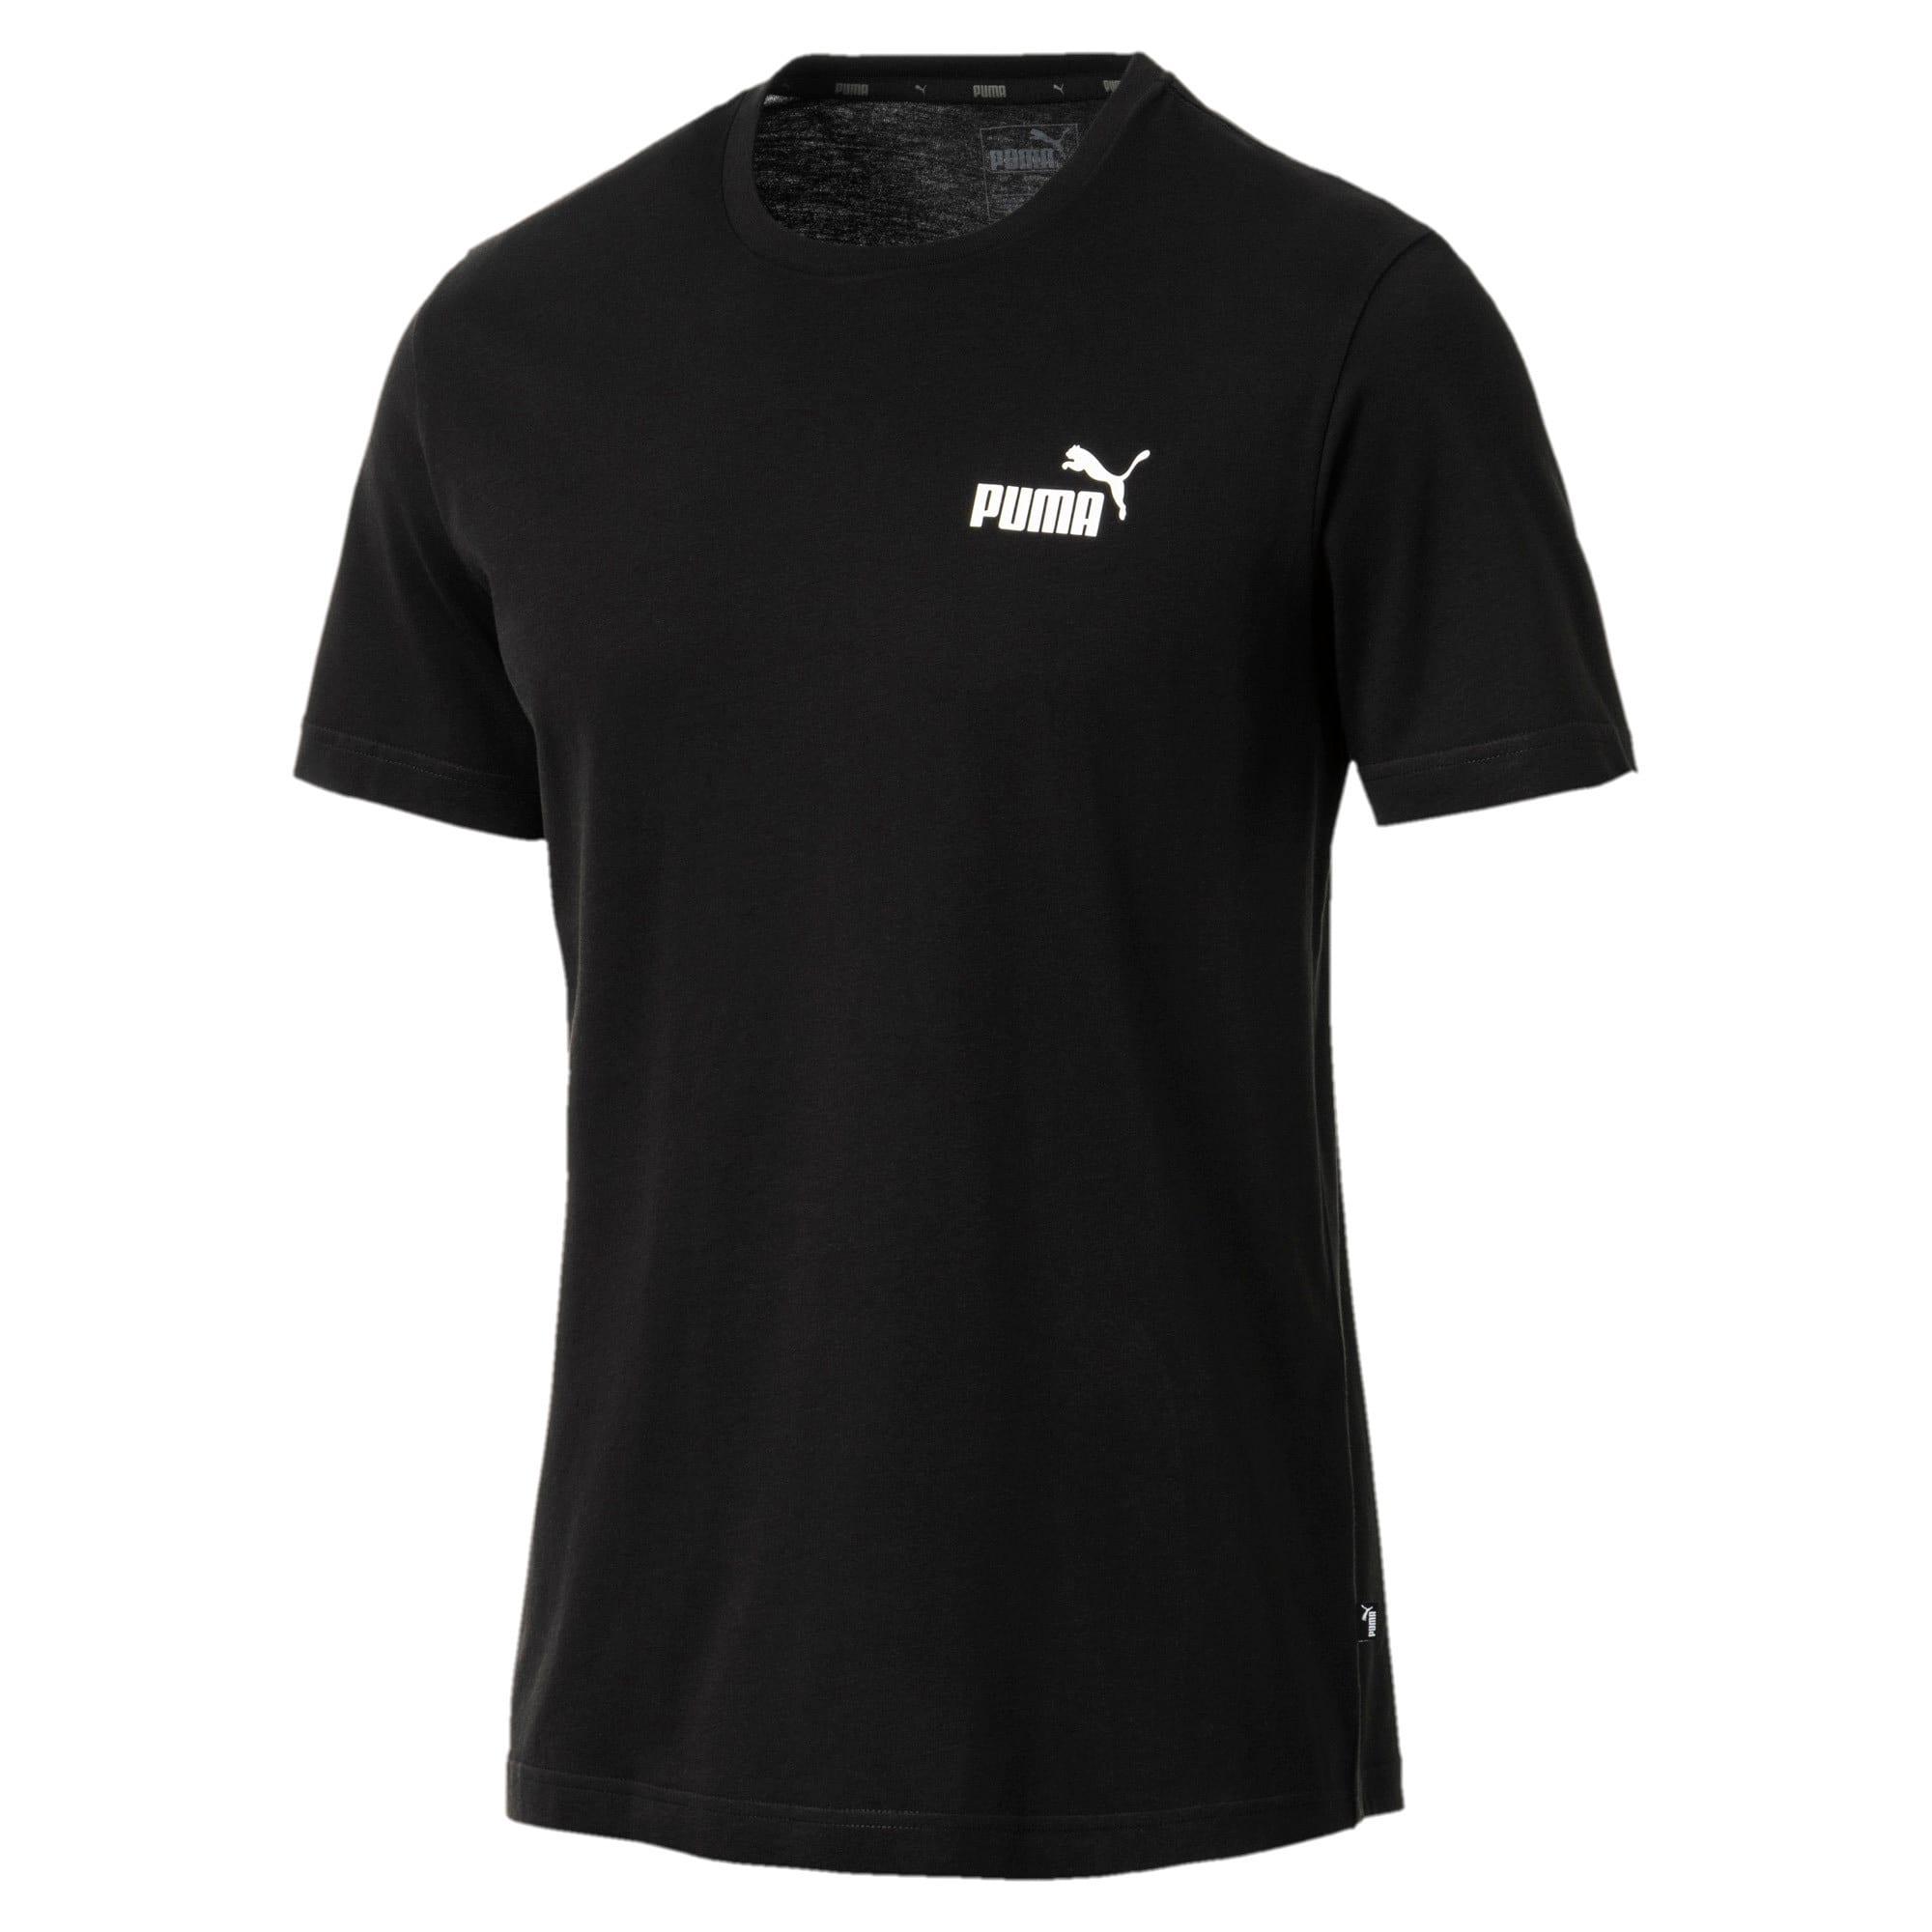 Thumbnail 1 of T-shirt con logo piccolo Essentials uomo, Cotton Black, medium